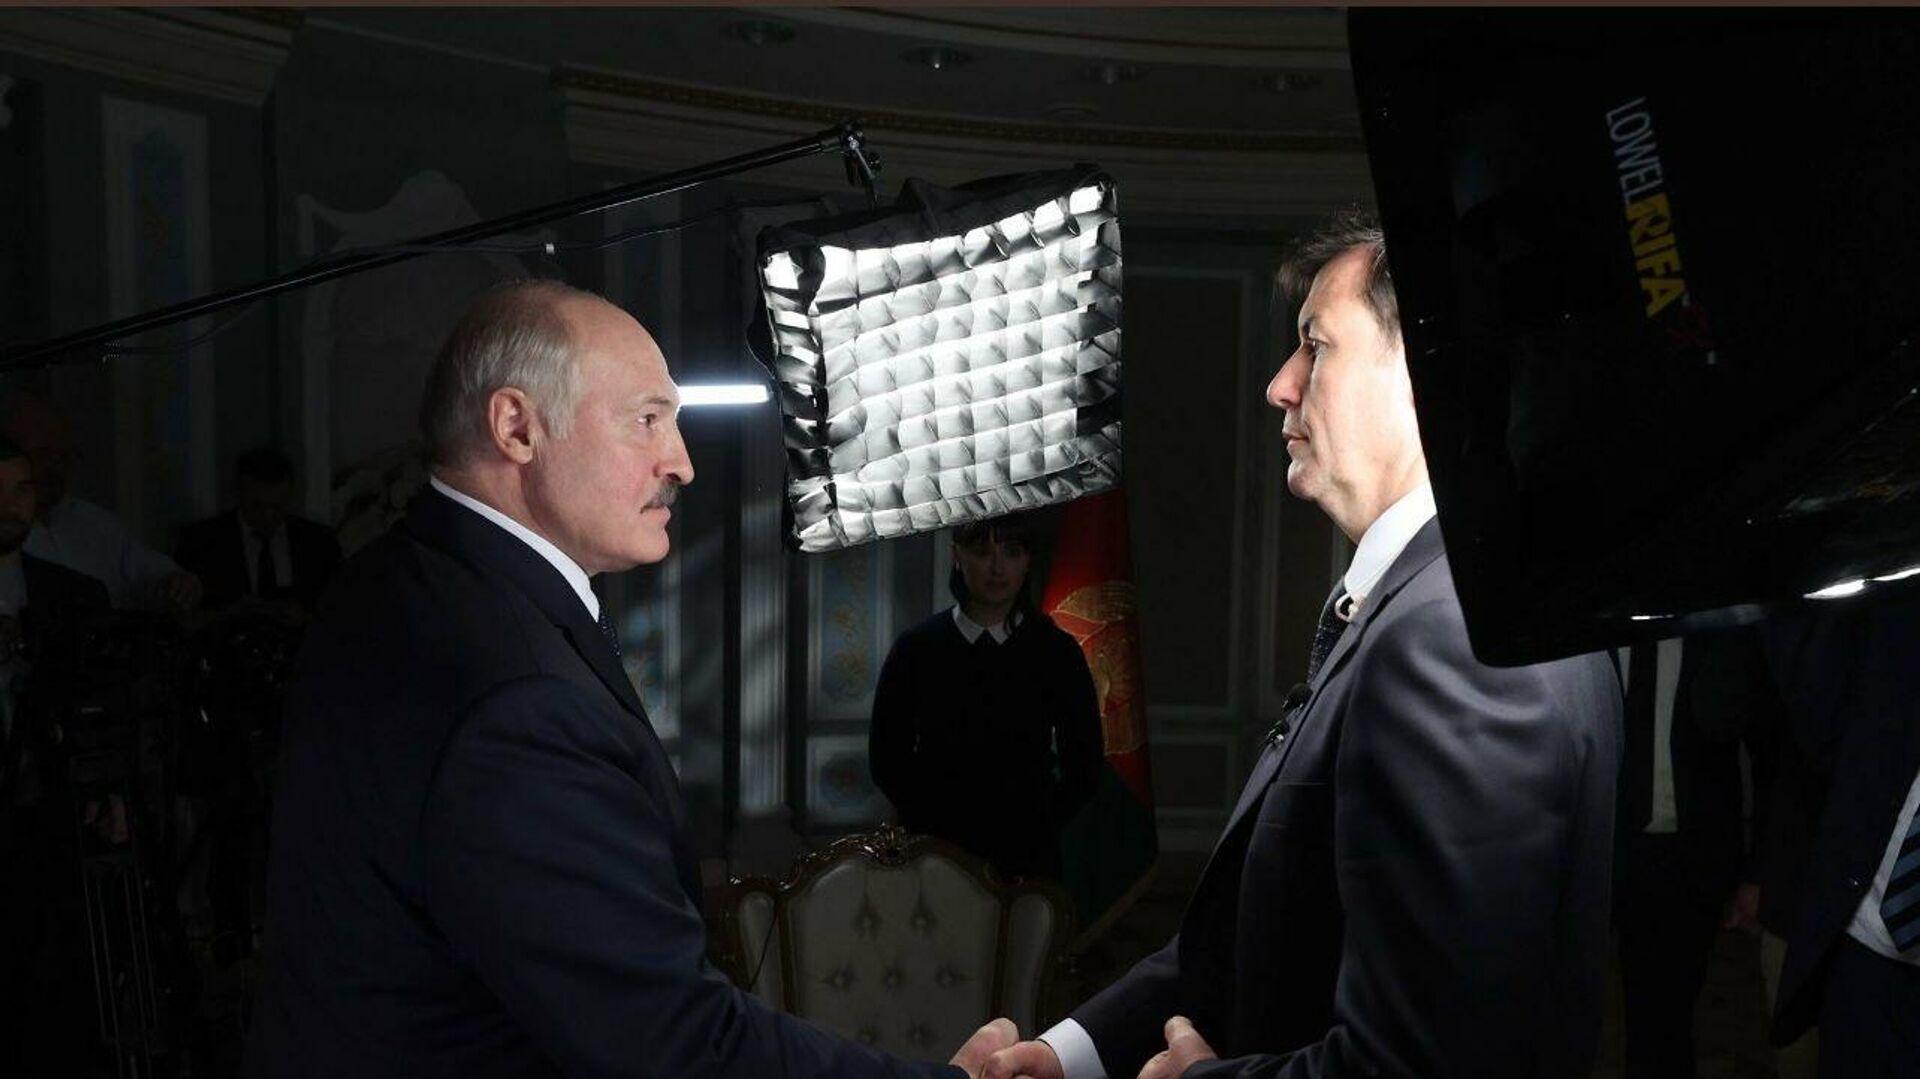 Prezydent Białorusi Alaksandr Łukaszenka i dziennikarz CNN - Sputnik Polska, 1920, 02.10.2021